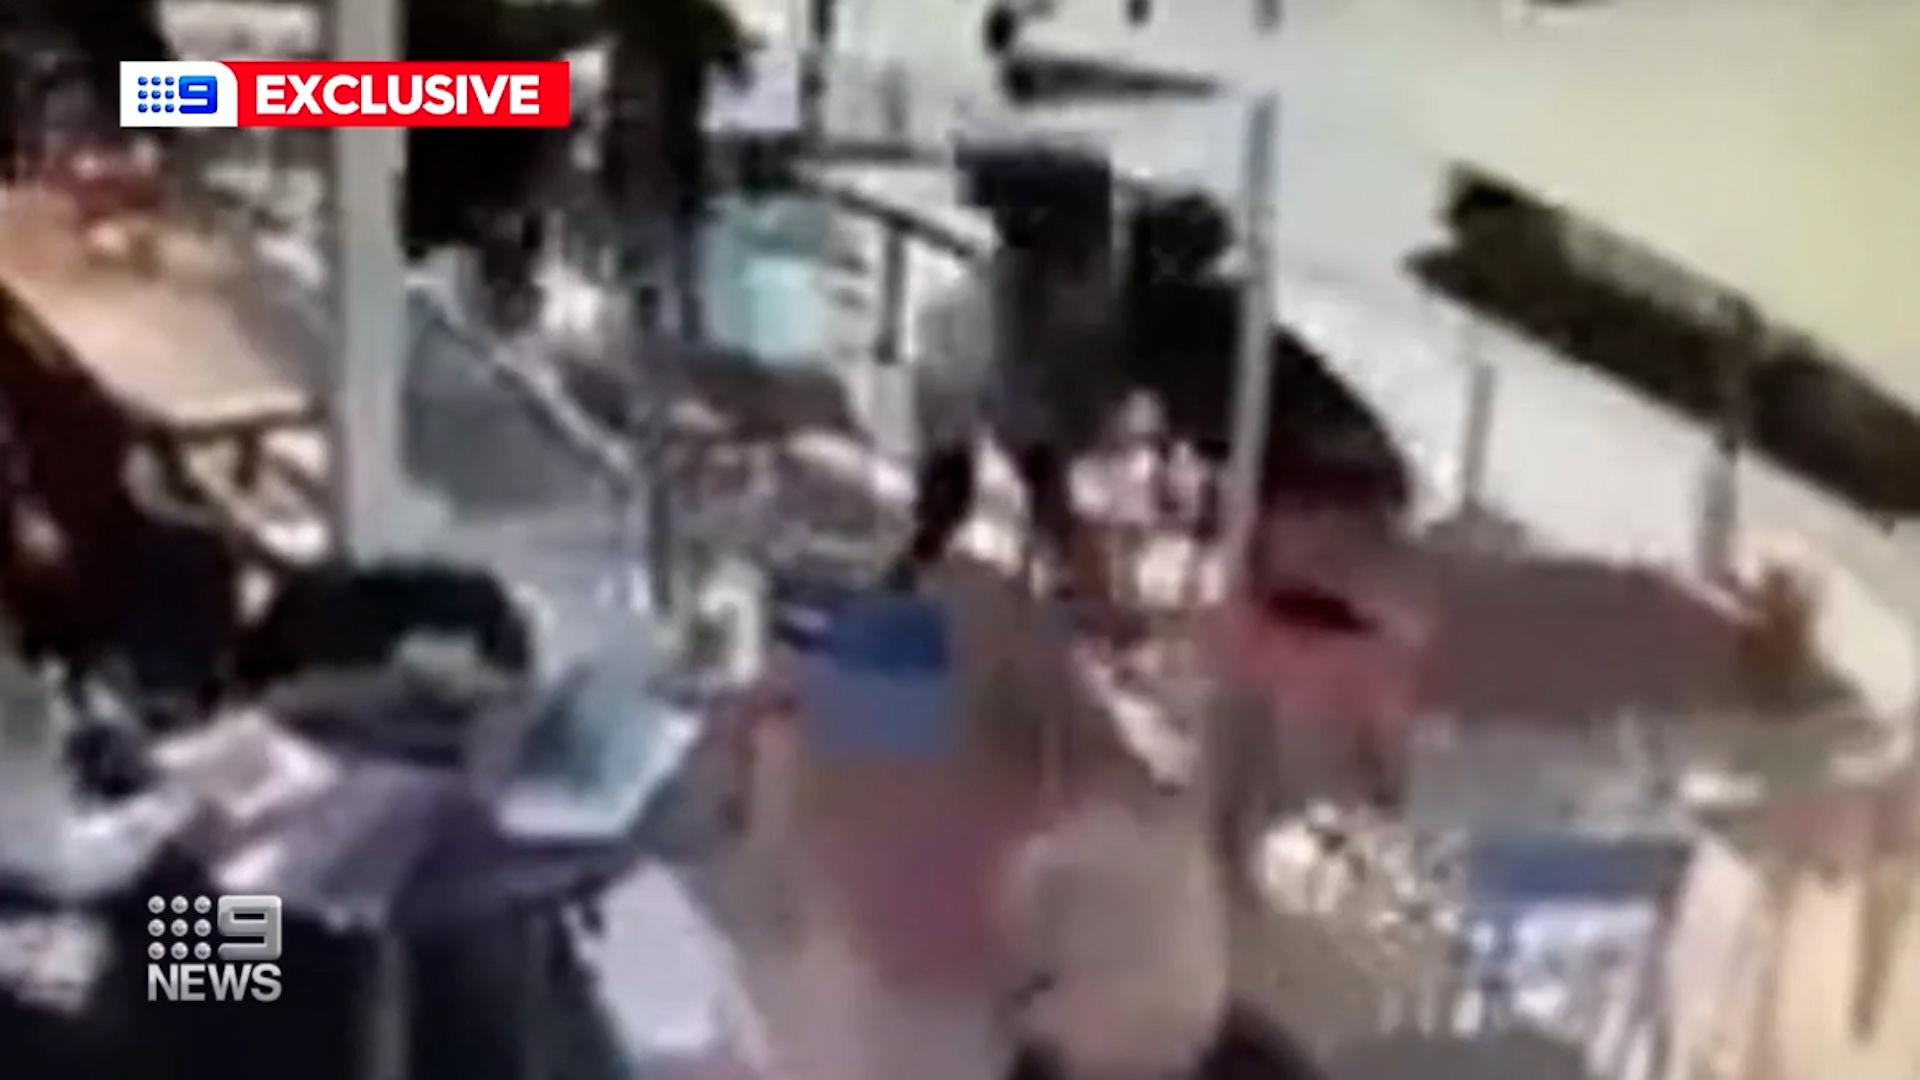 The 'real story' behind vicious bikie brawl